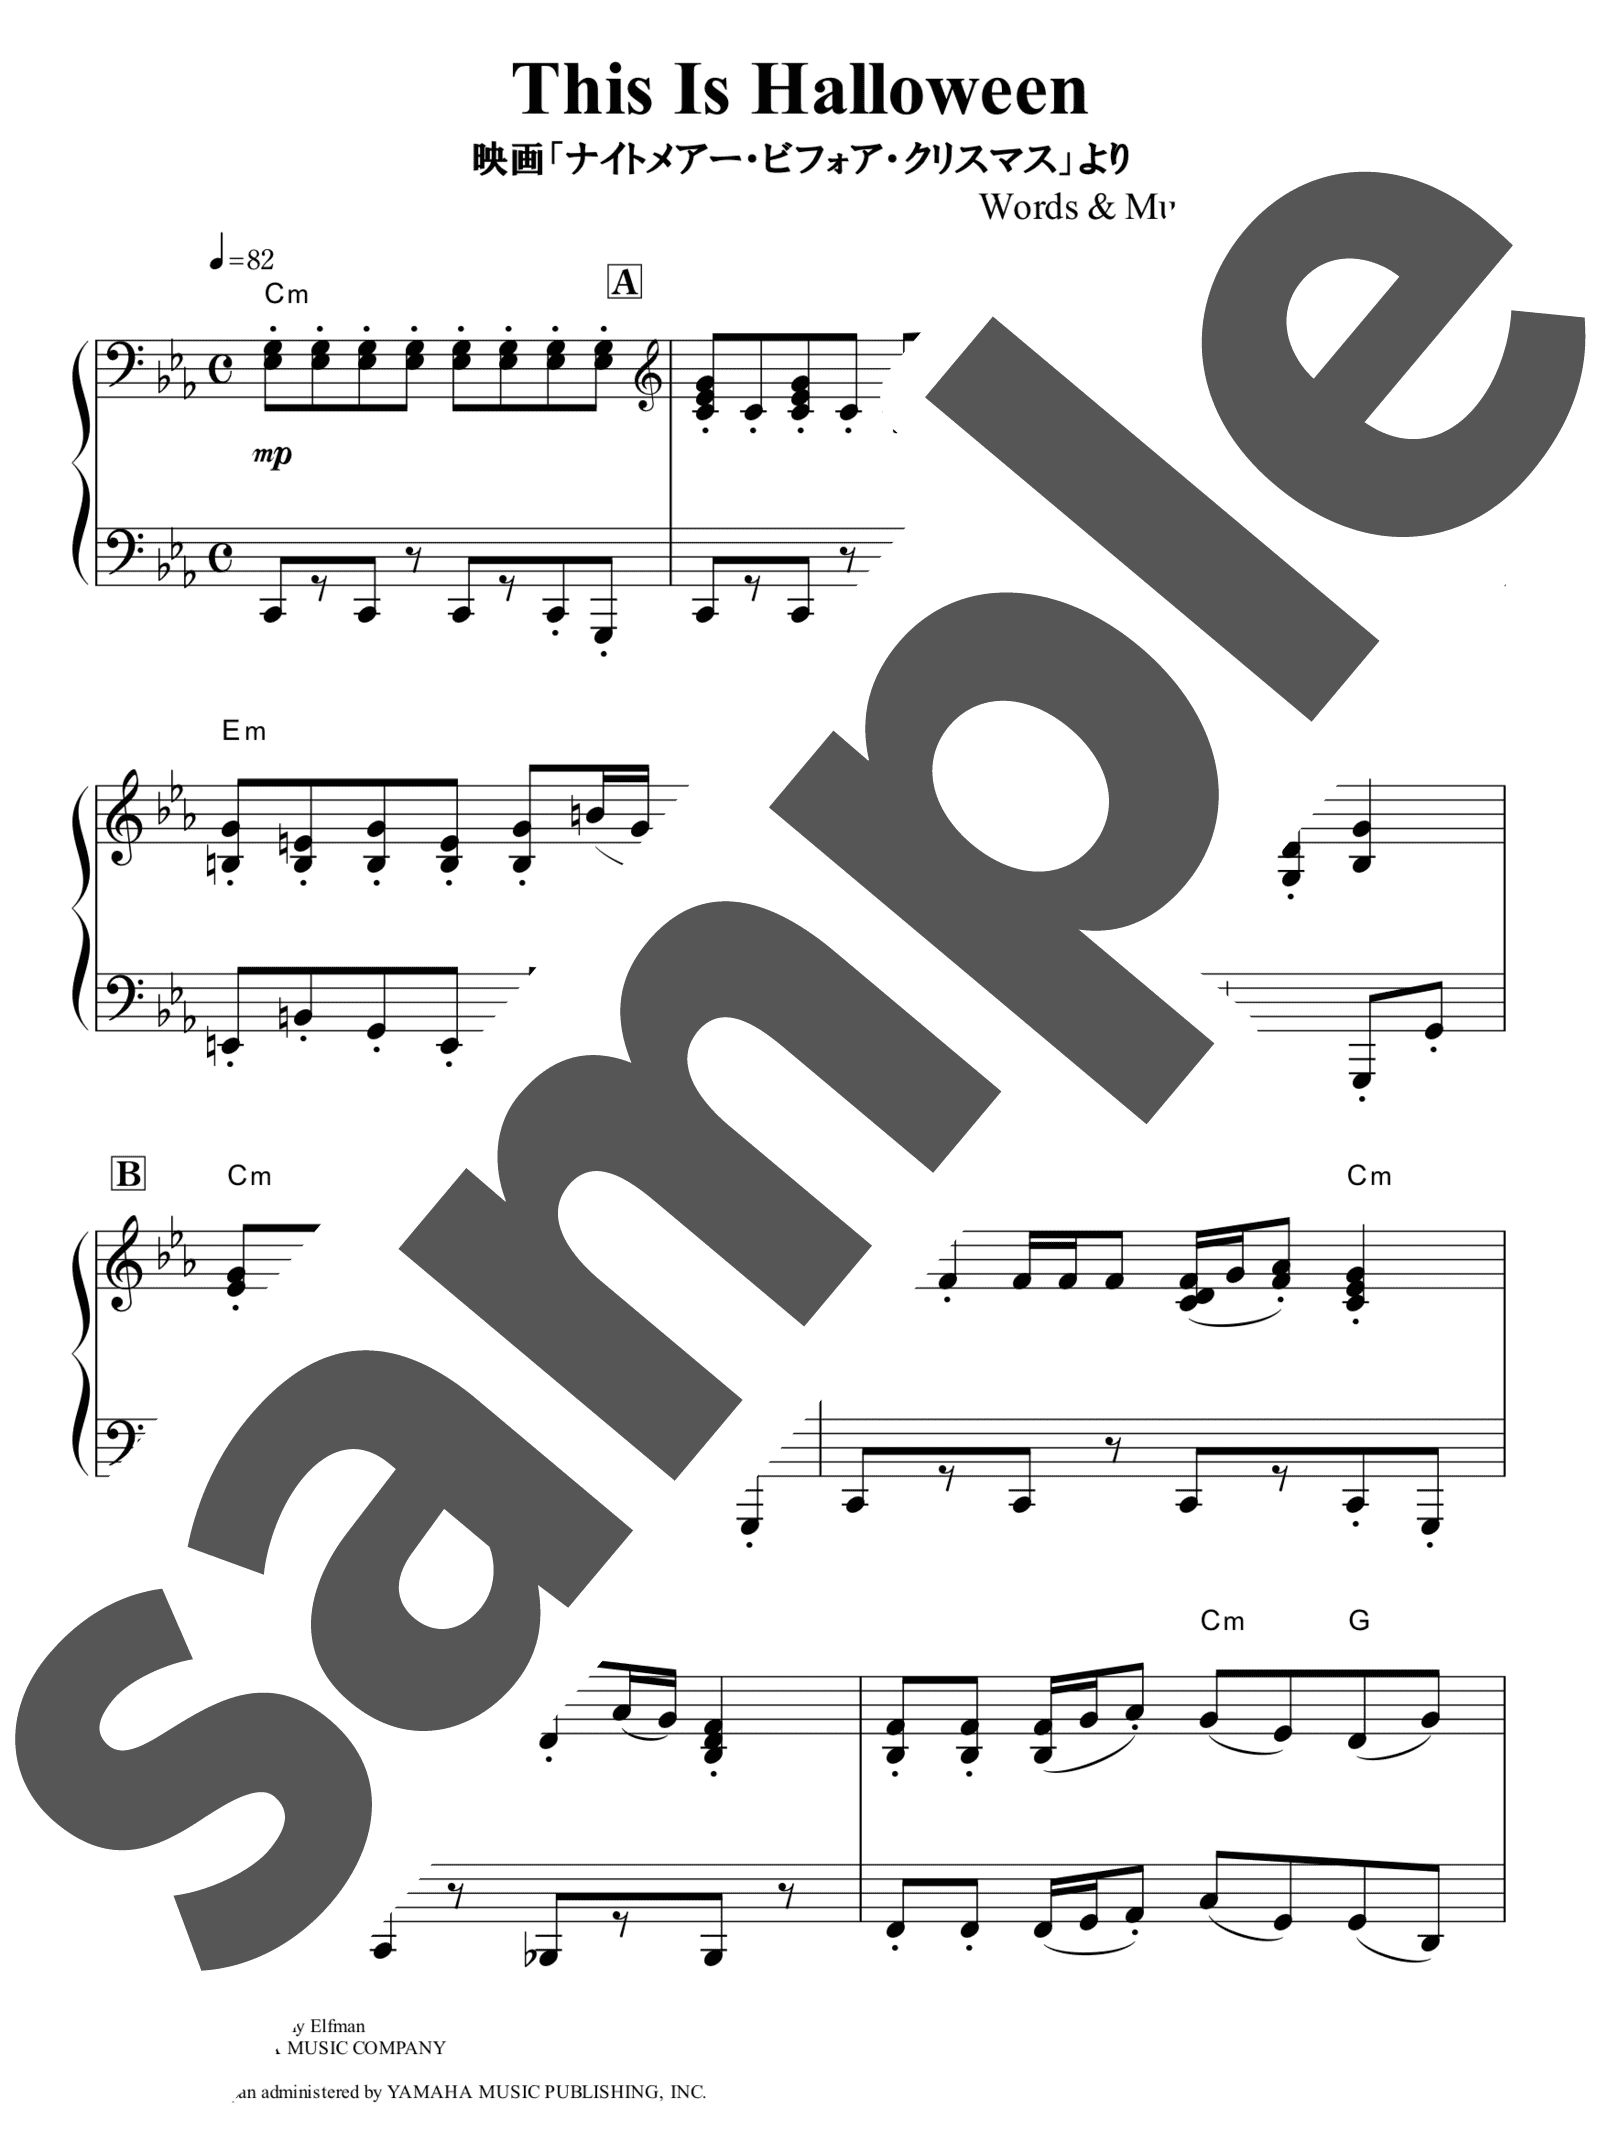 「This is Halloween」のサンプル楽譜